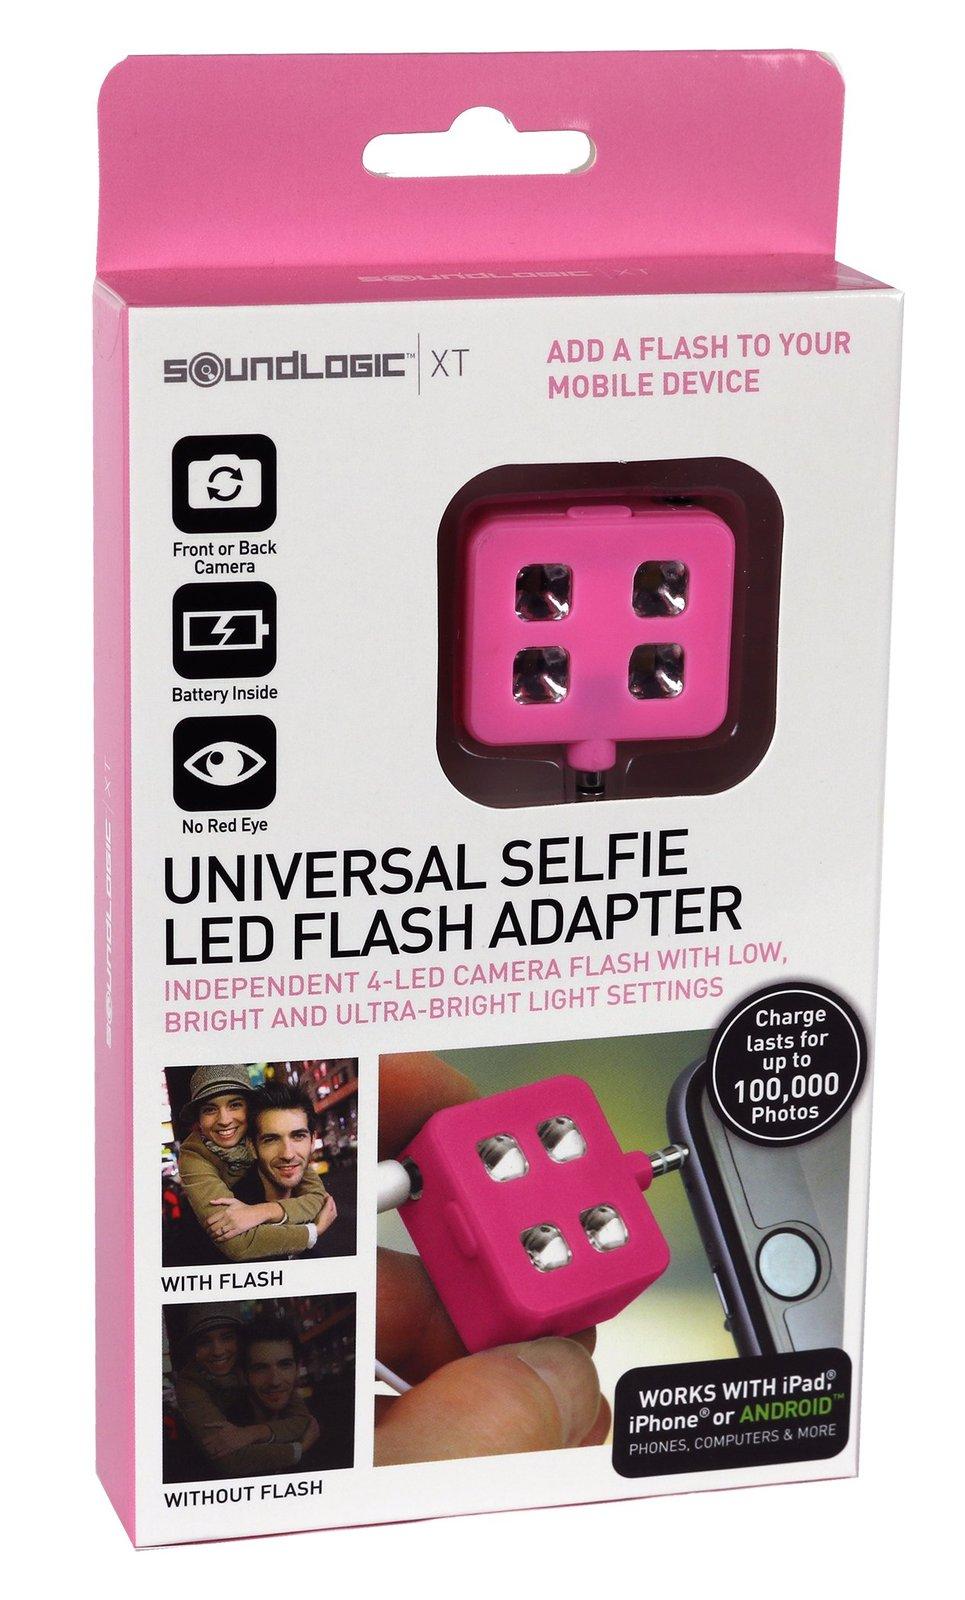 soundlogic xt universal 4 led selfie flash light adapter pink pda accessories. Black Bedroom Furniture Sets. Home Design Ideas